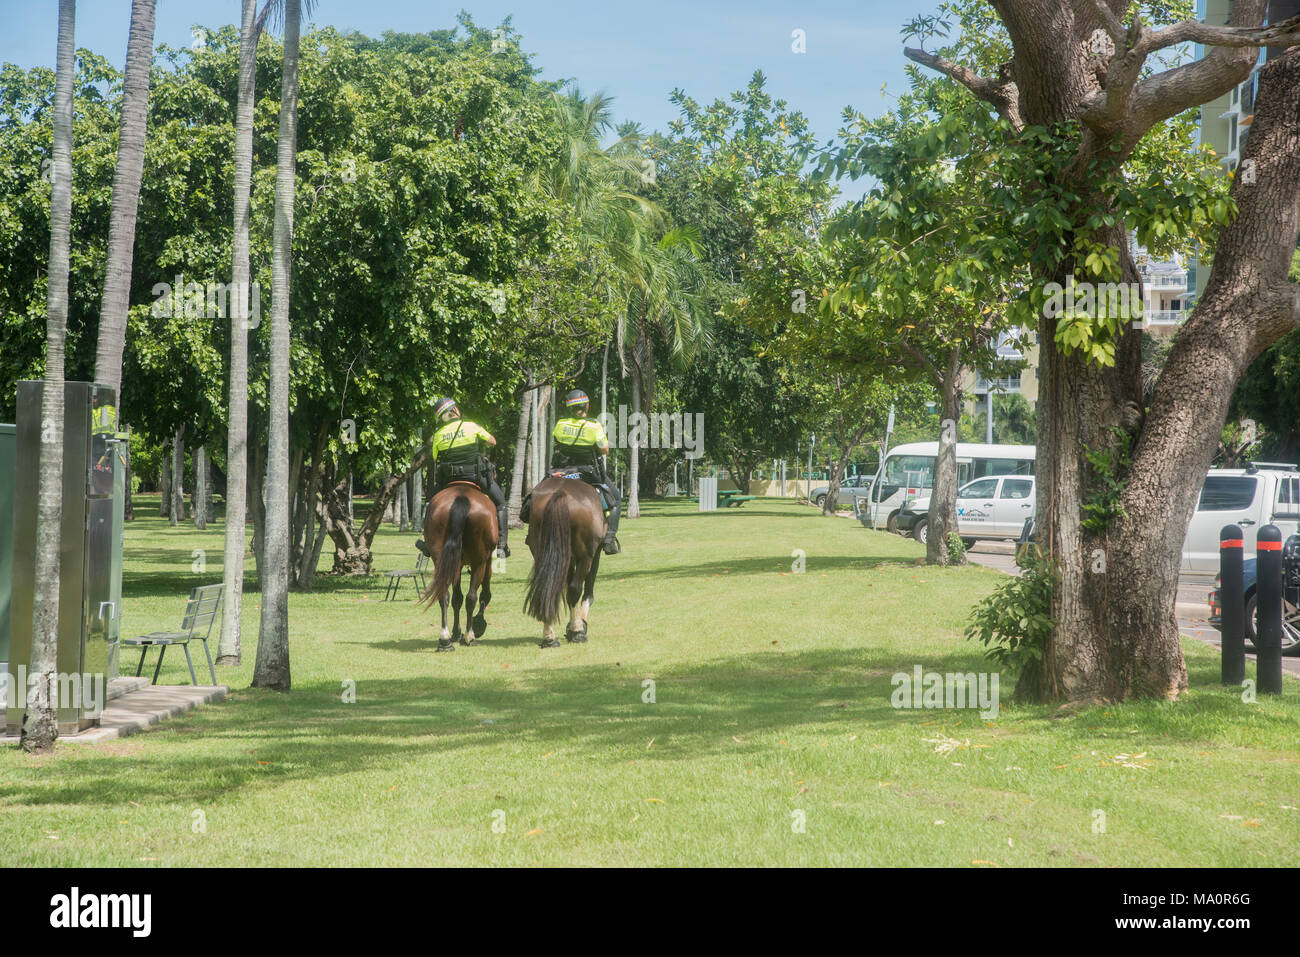 Darwin,Northern Territory,Australia-February 21,2018: Police force on horseback at Bicentennial Park with greenery in Darwin, Australia - Stock Image